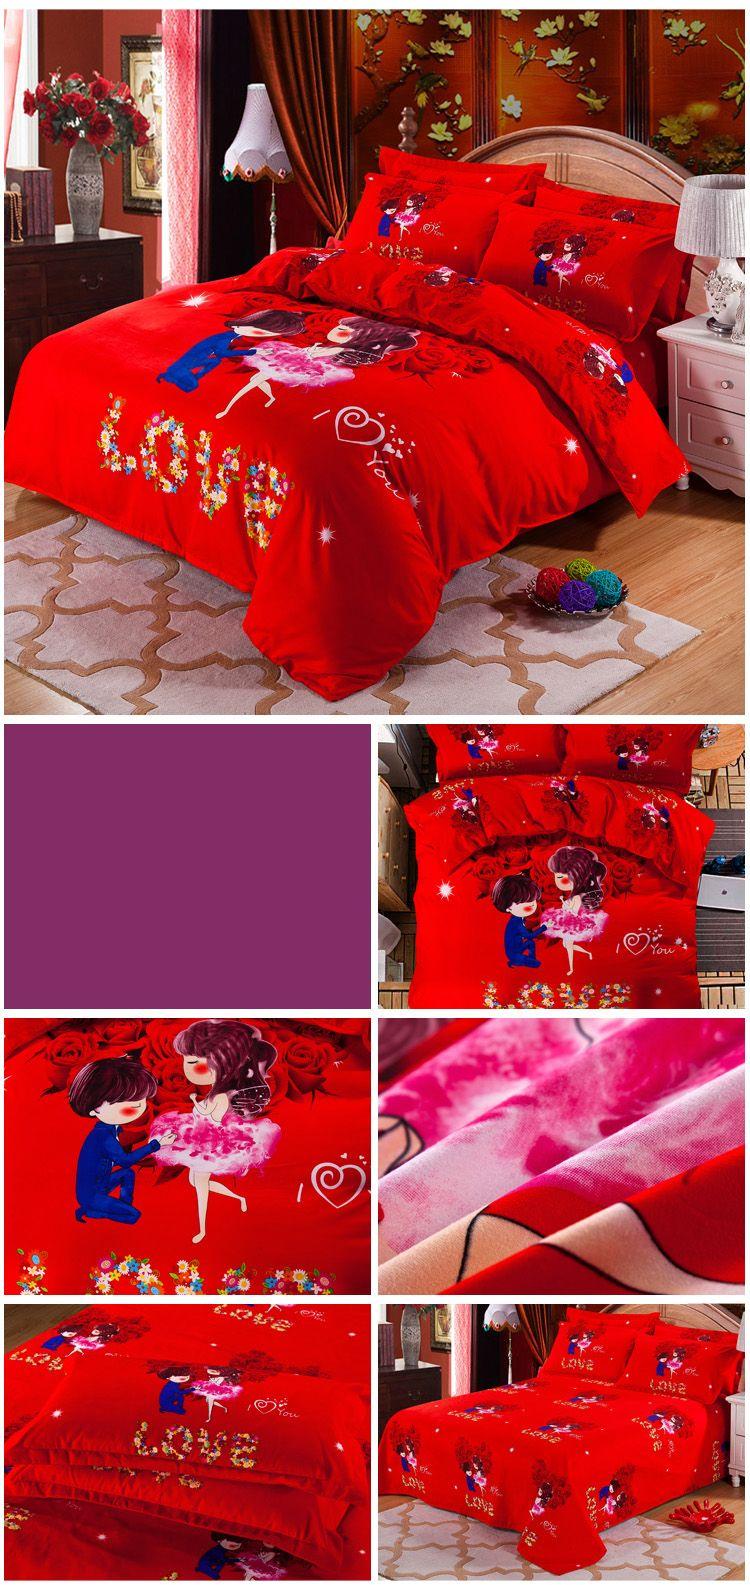 Autumn Loving life Pattern Bedding article Four piece suit